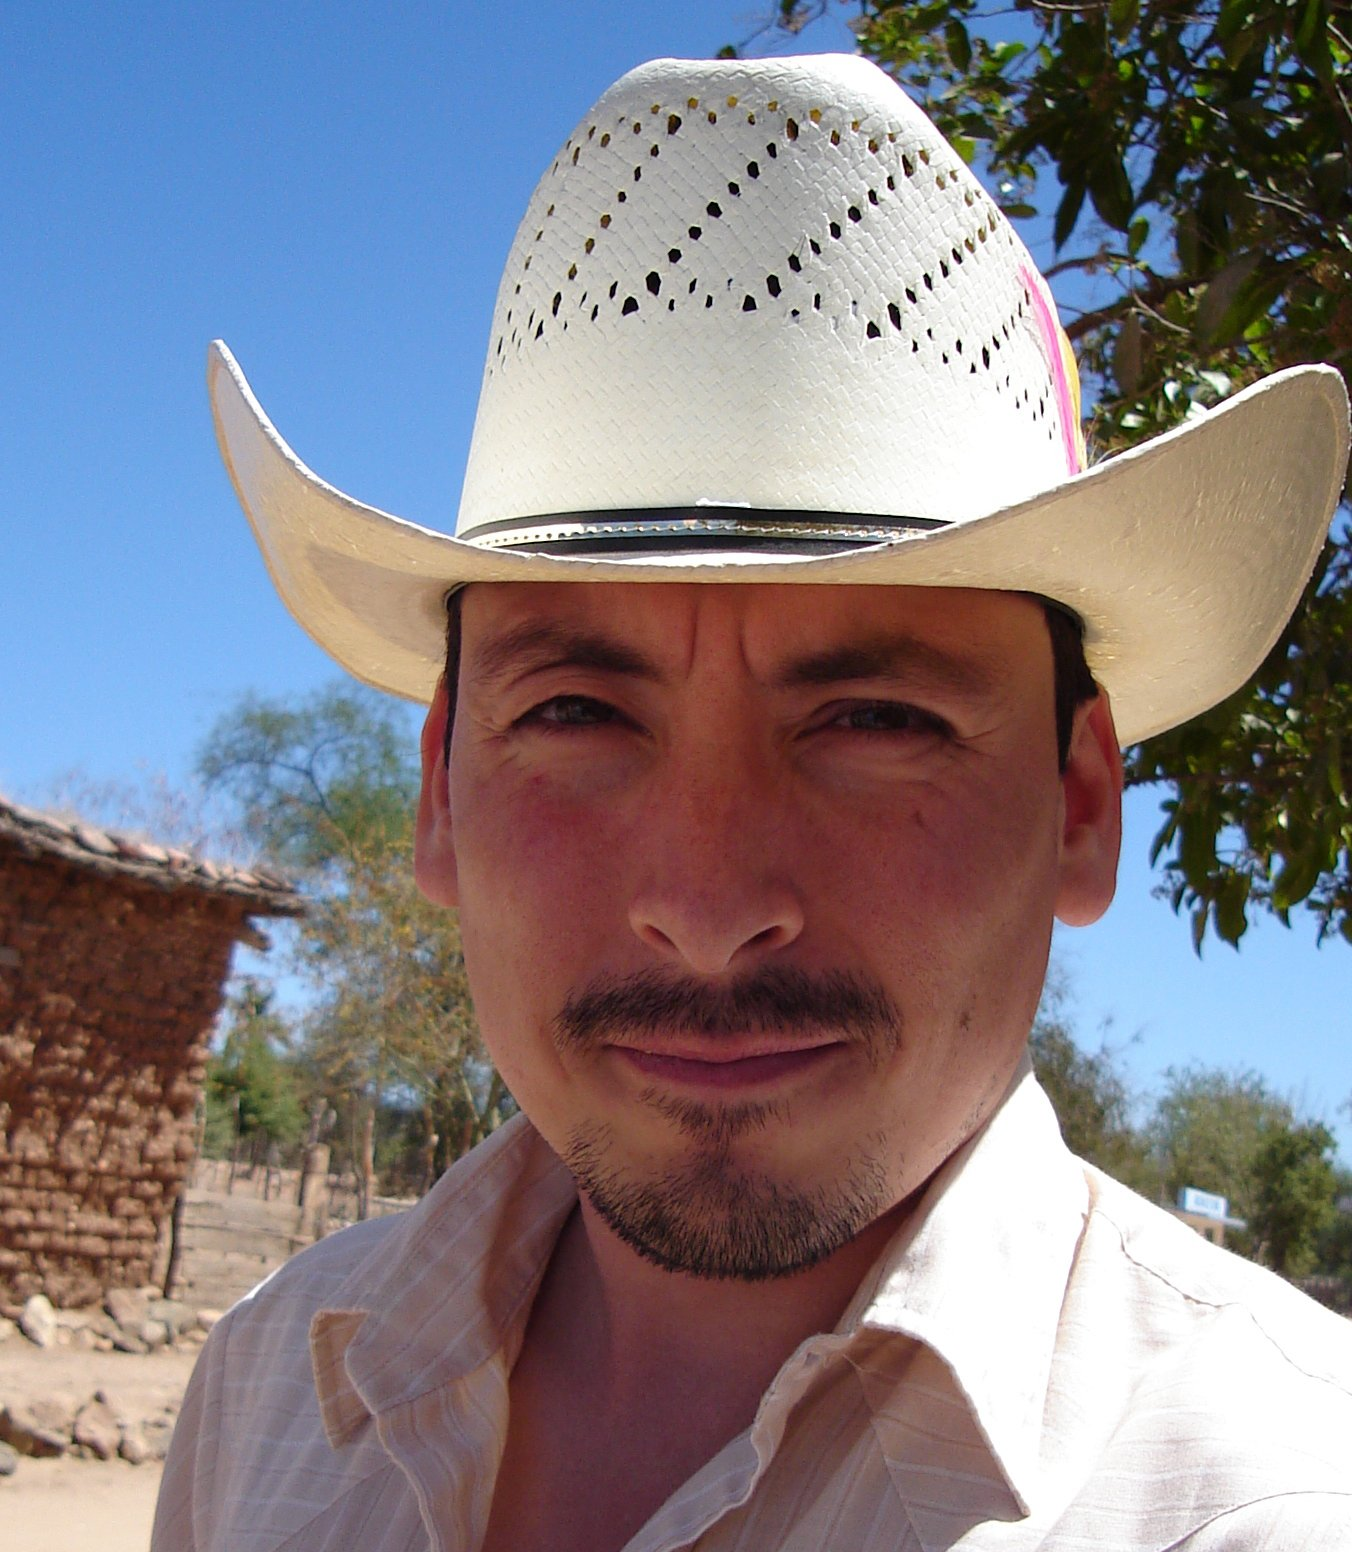 Steven Alvarez